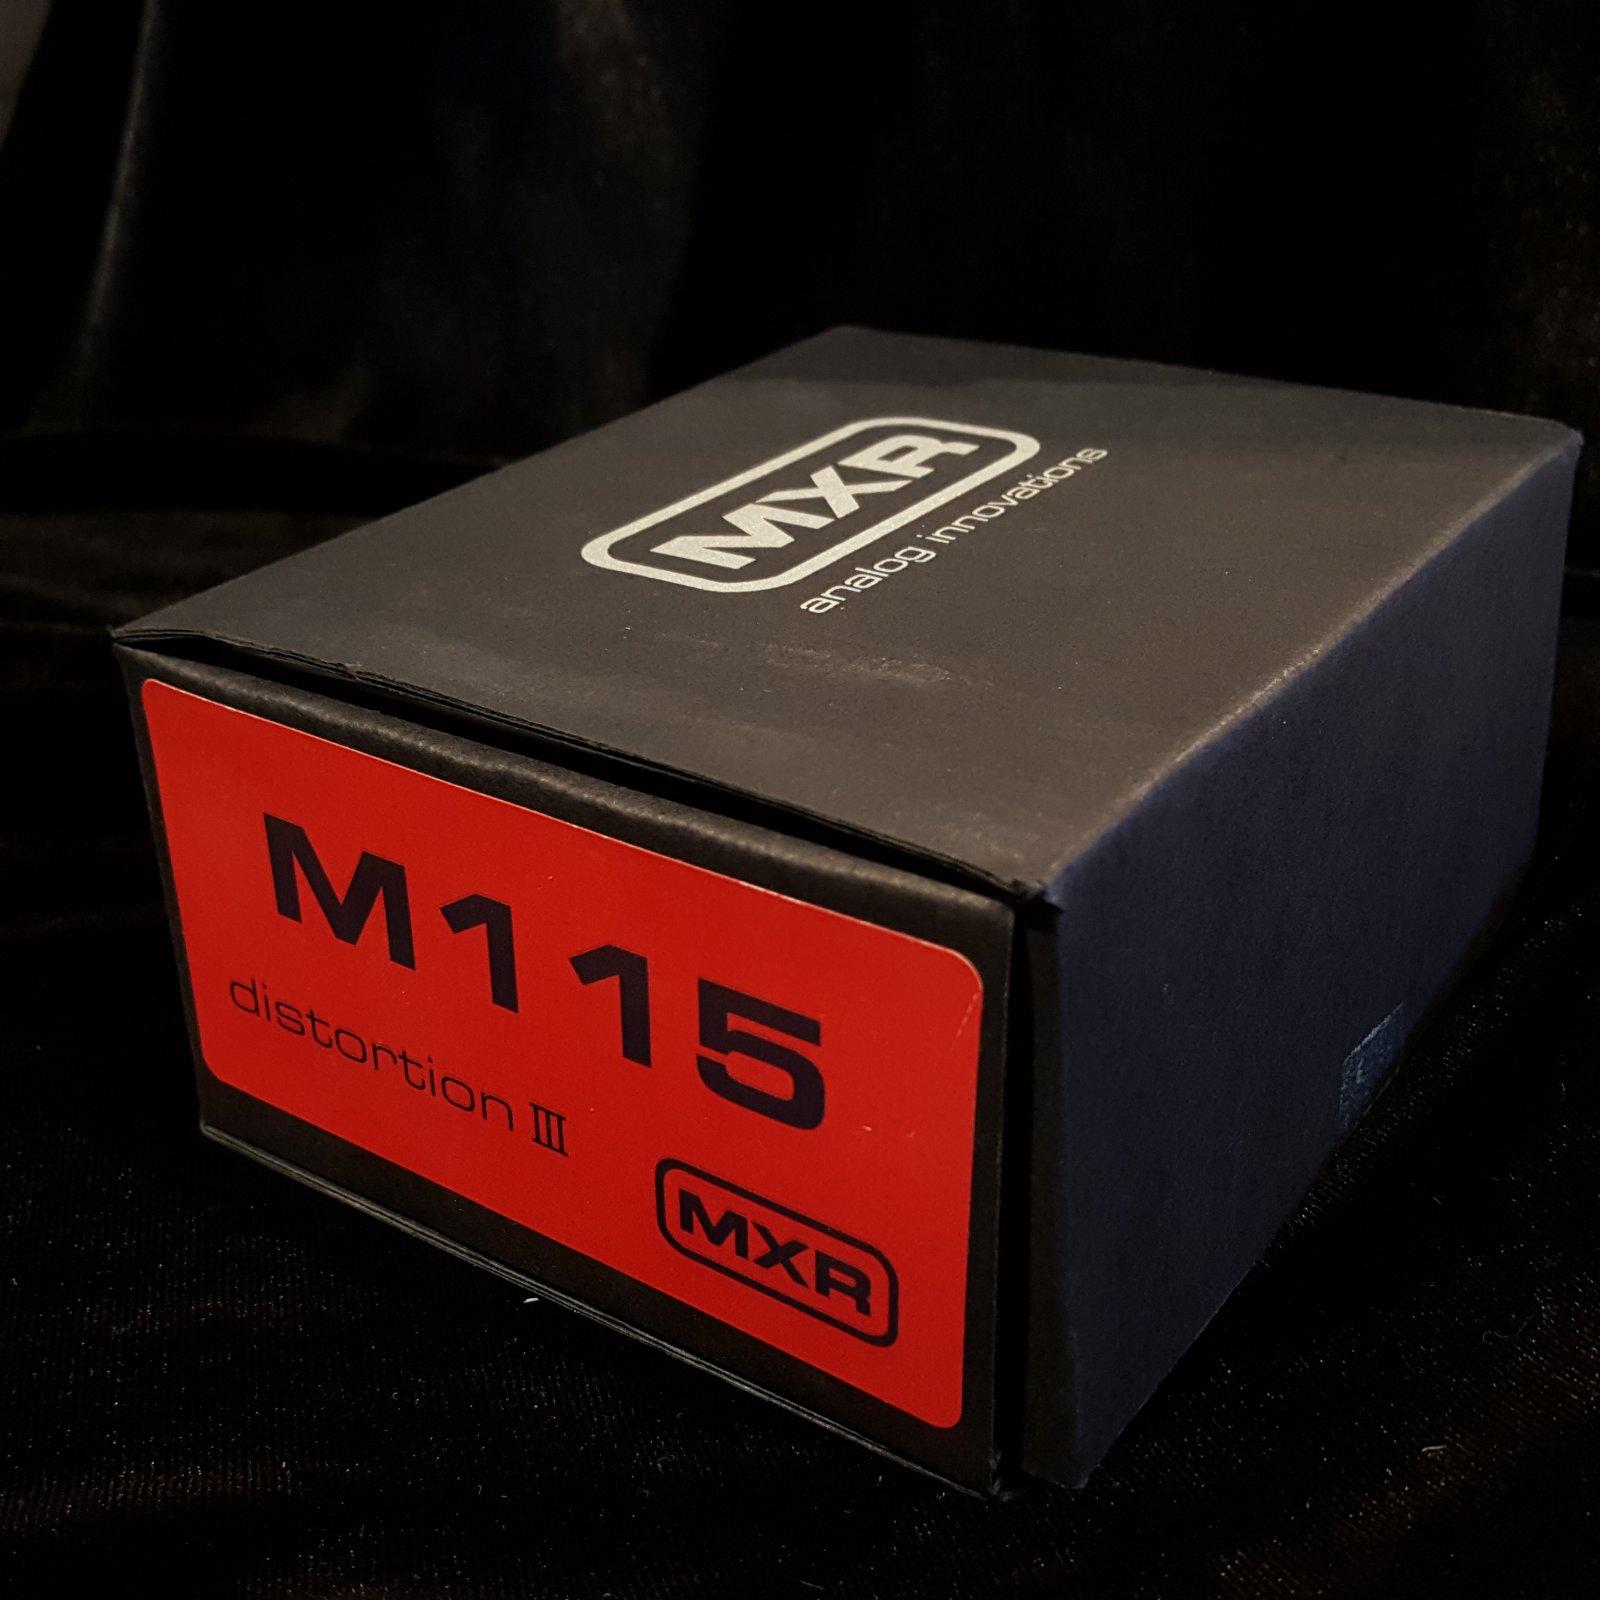 MXR M115 Distortion III Guitar Effects Pedal